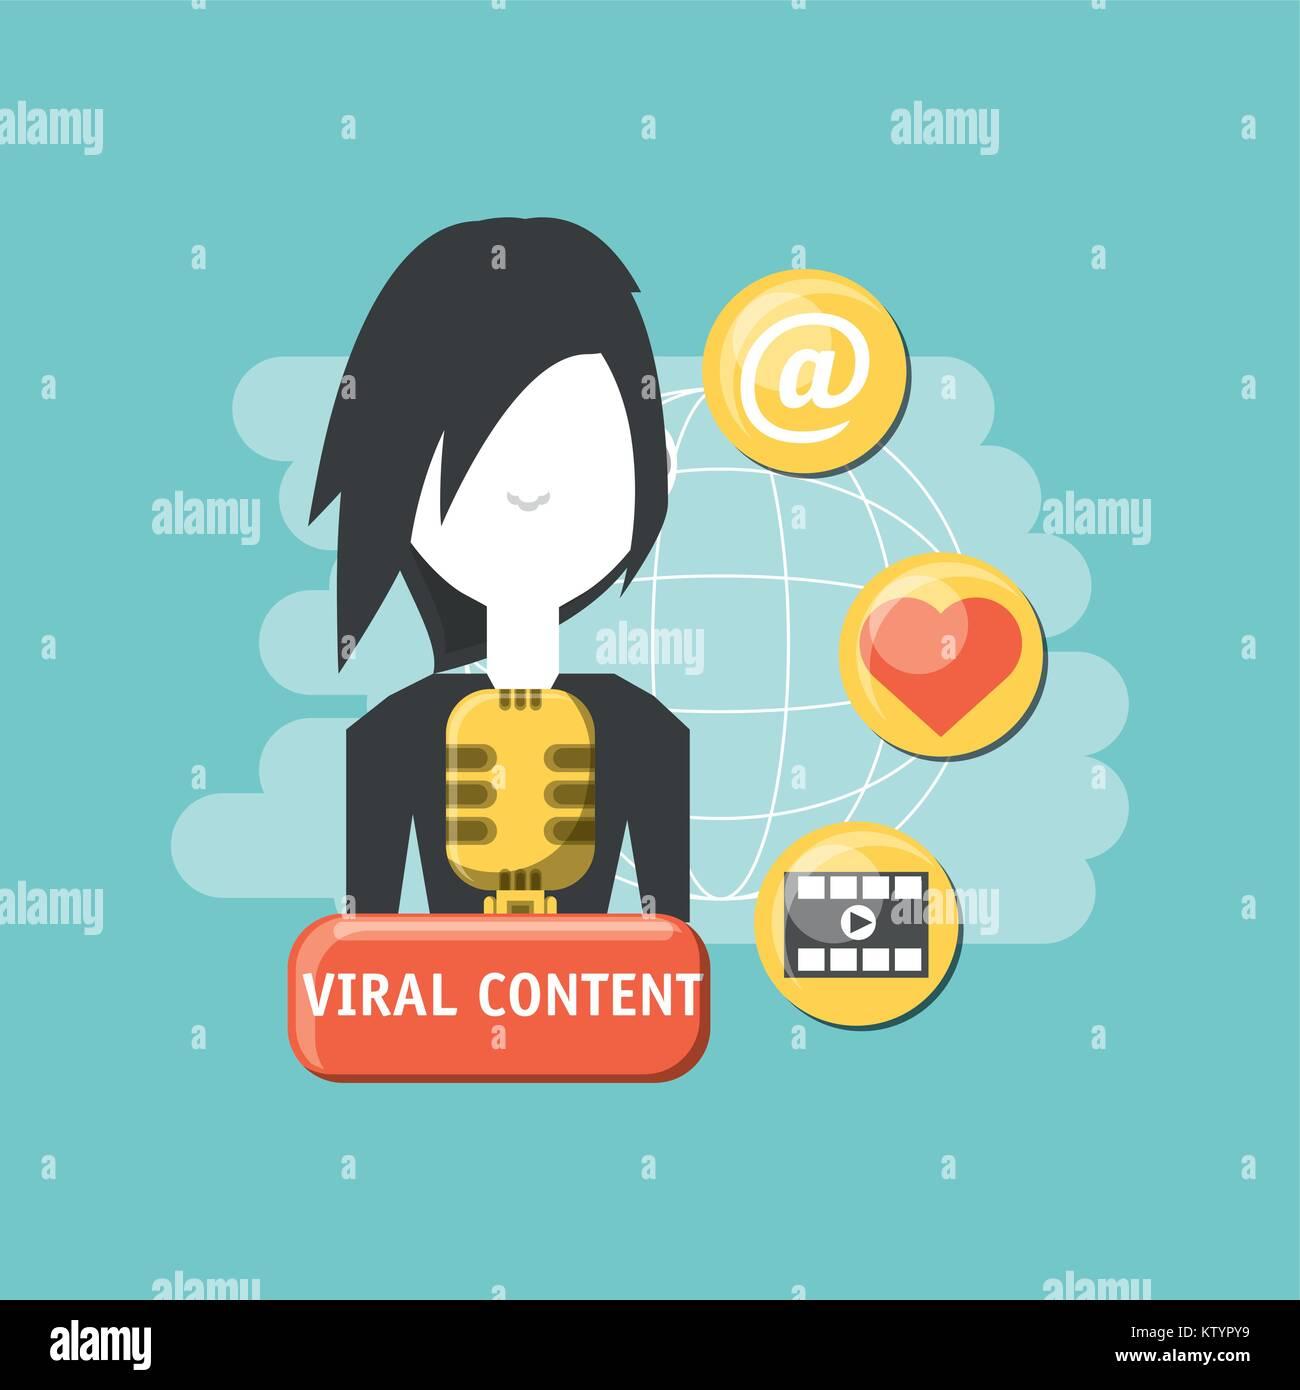 Diseño de contenido viral Imagen De Stock